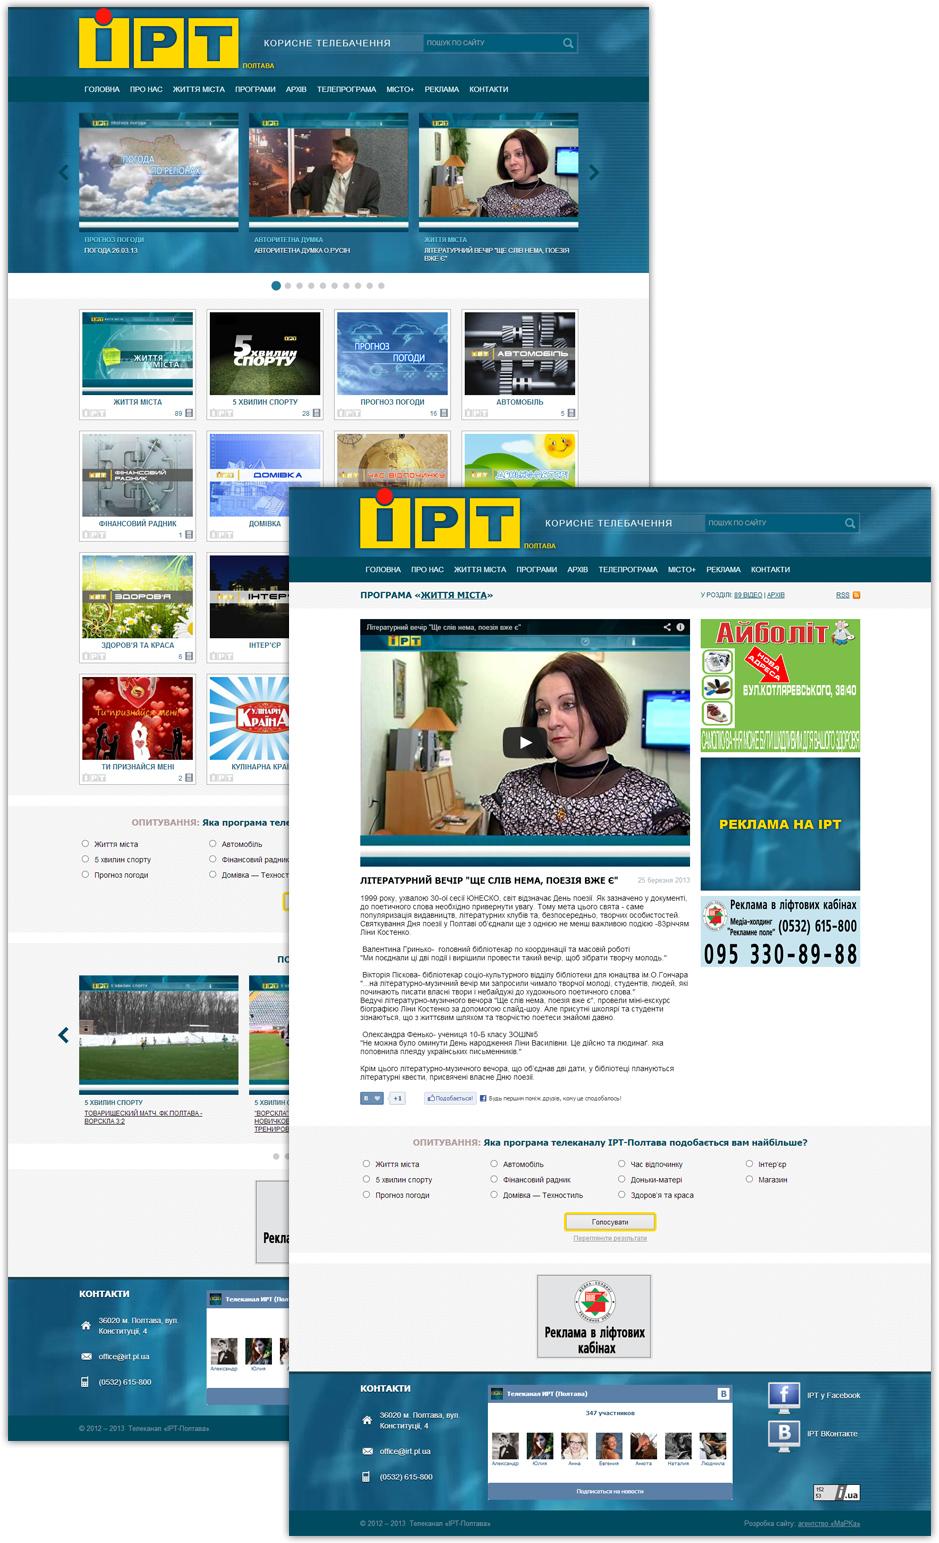 Продвижение сайтов телеканалов phpbb an xrumer service is alive